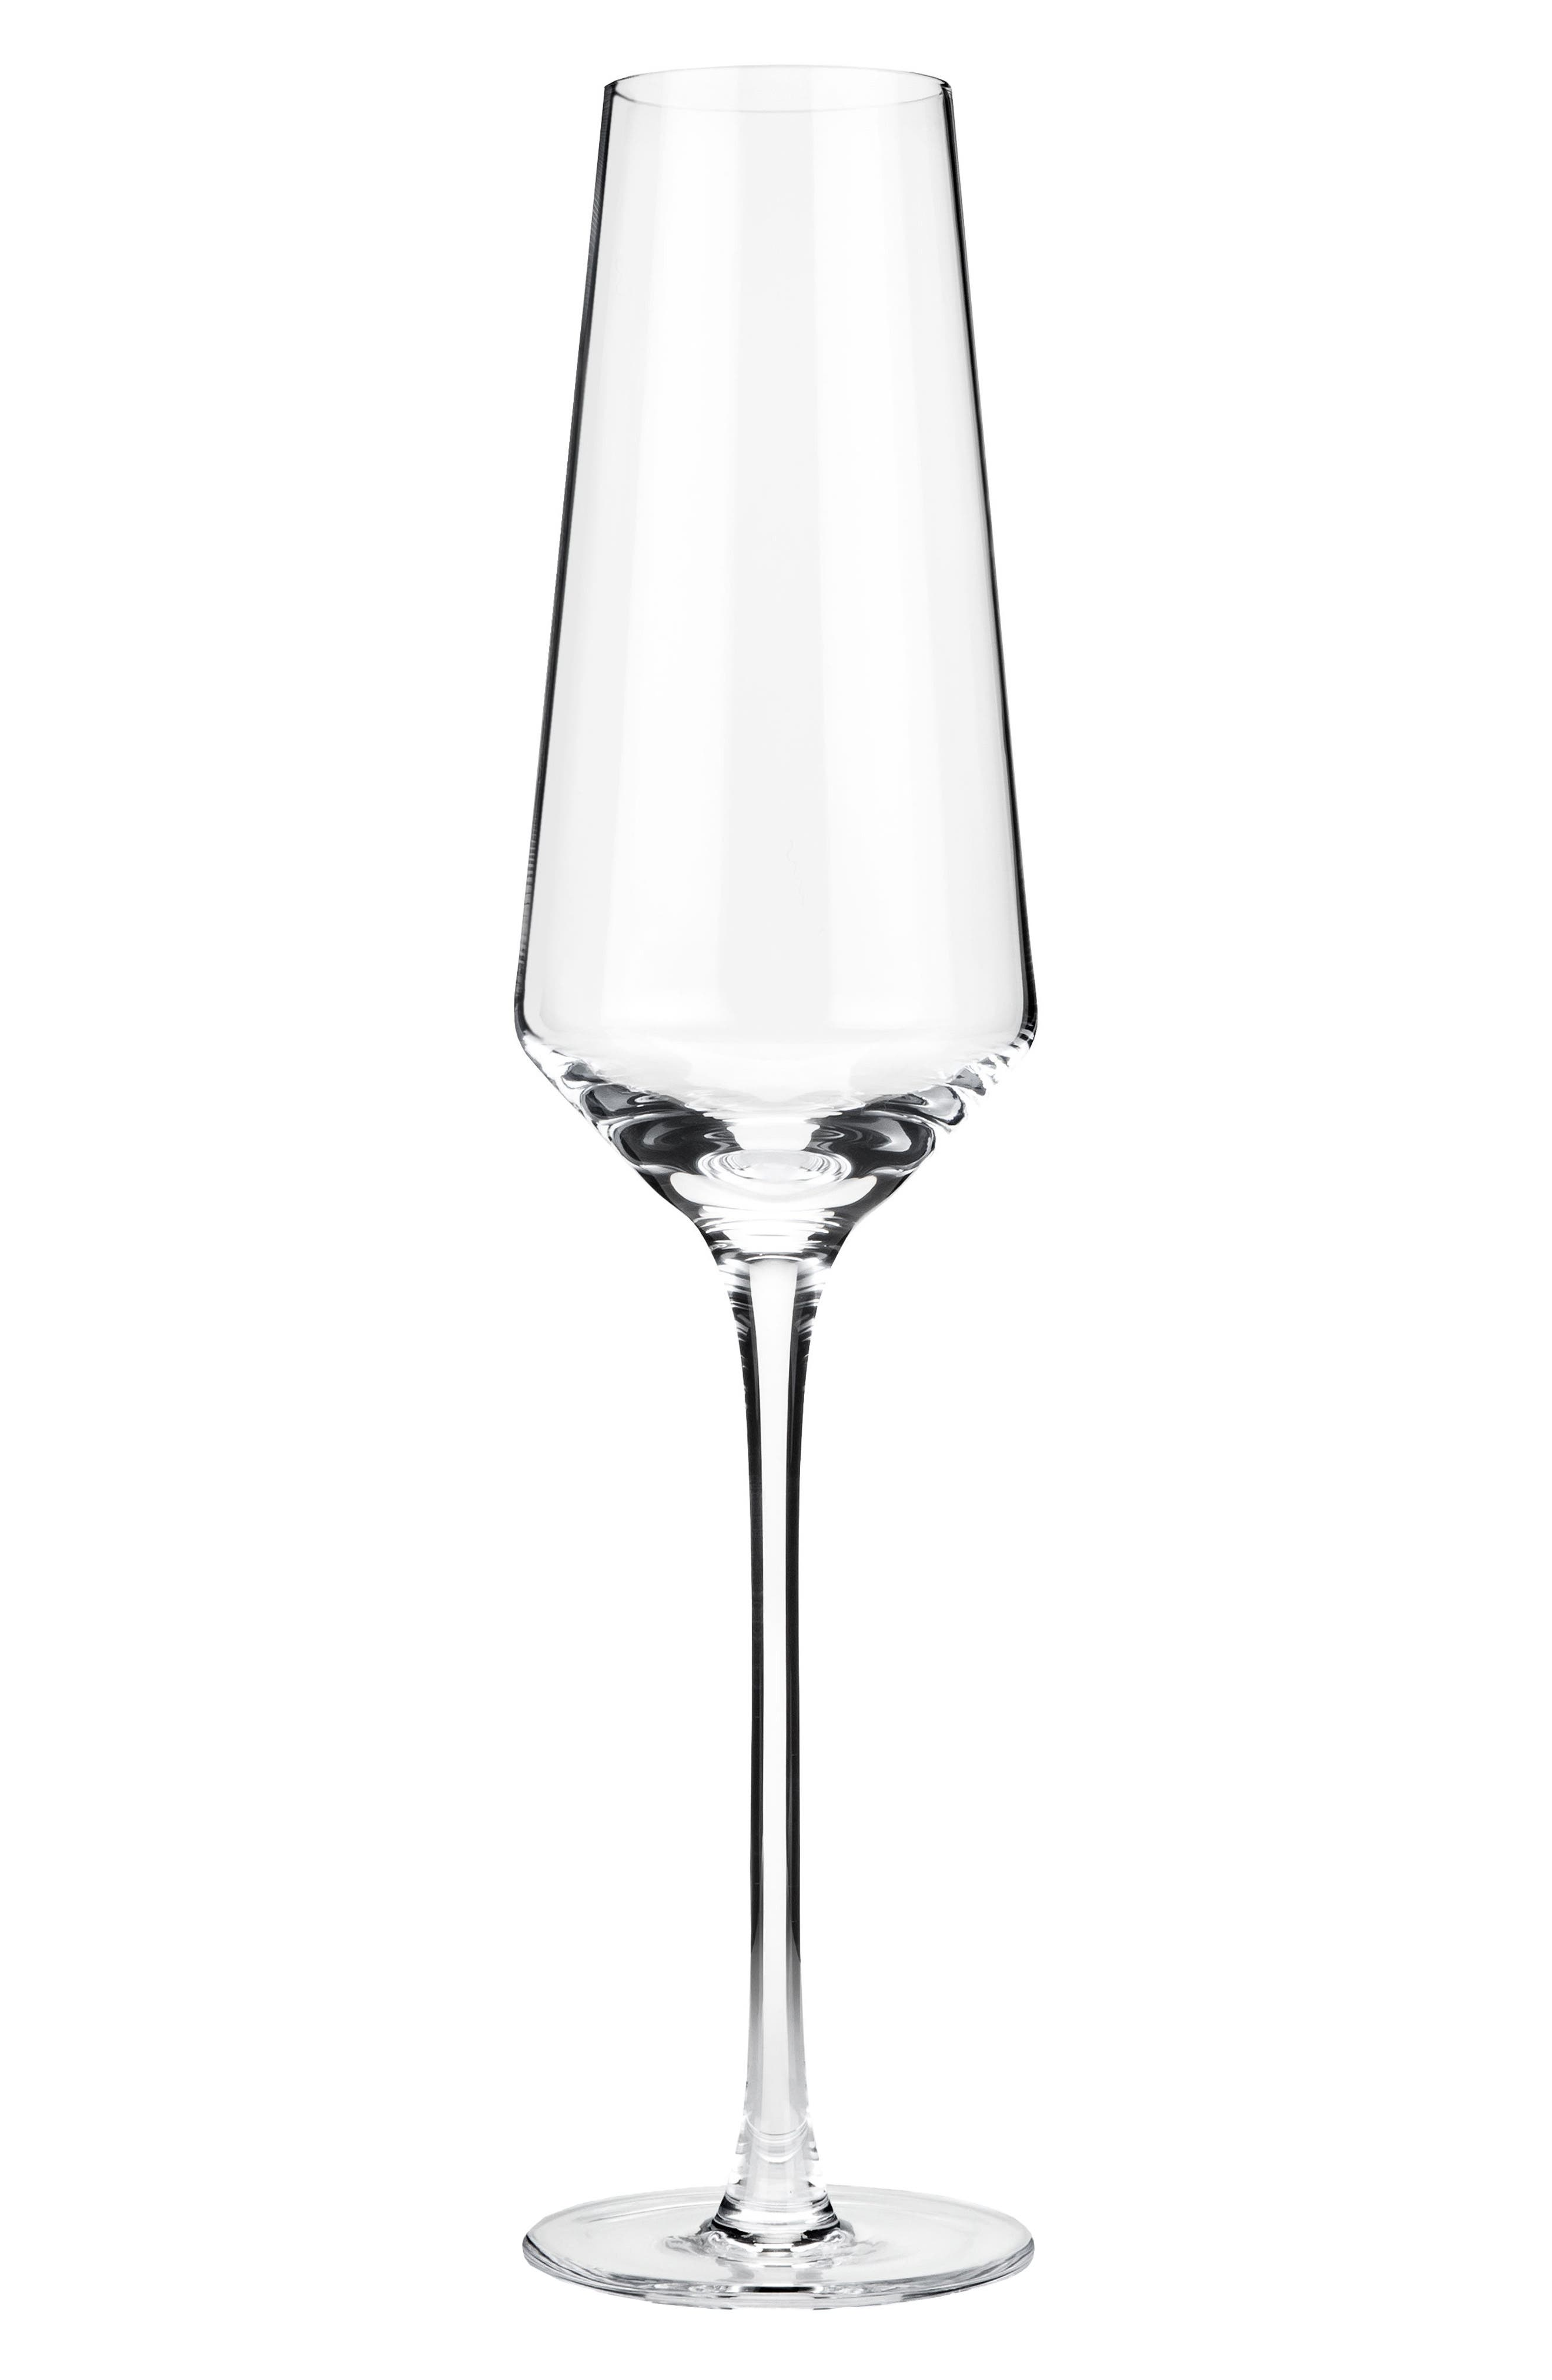 Main Image - Viski by True Fabrications Raye Set of 2 Crystal Champagne Flutes